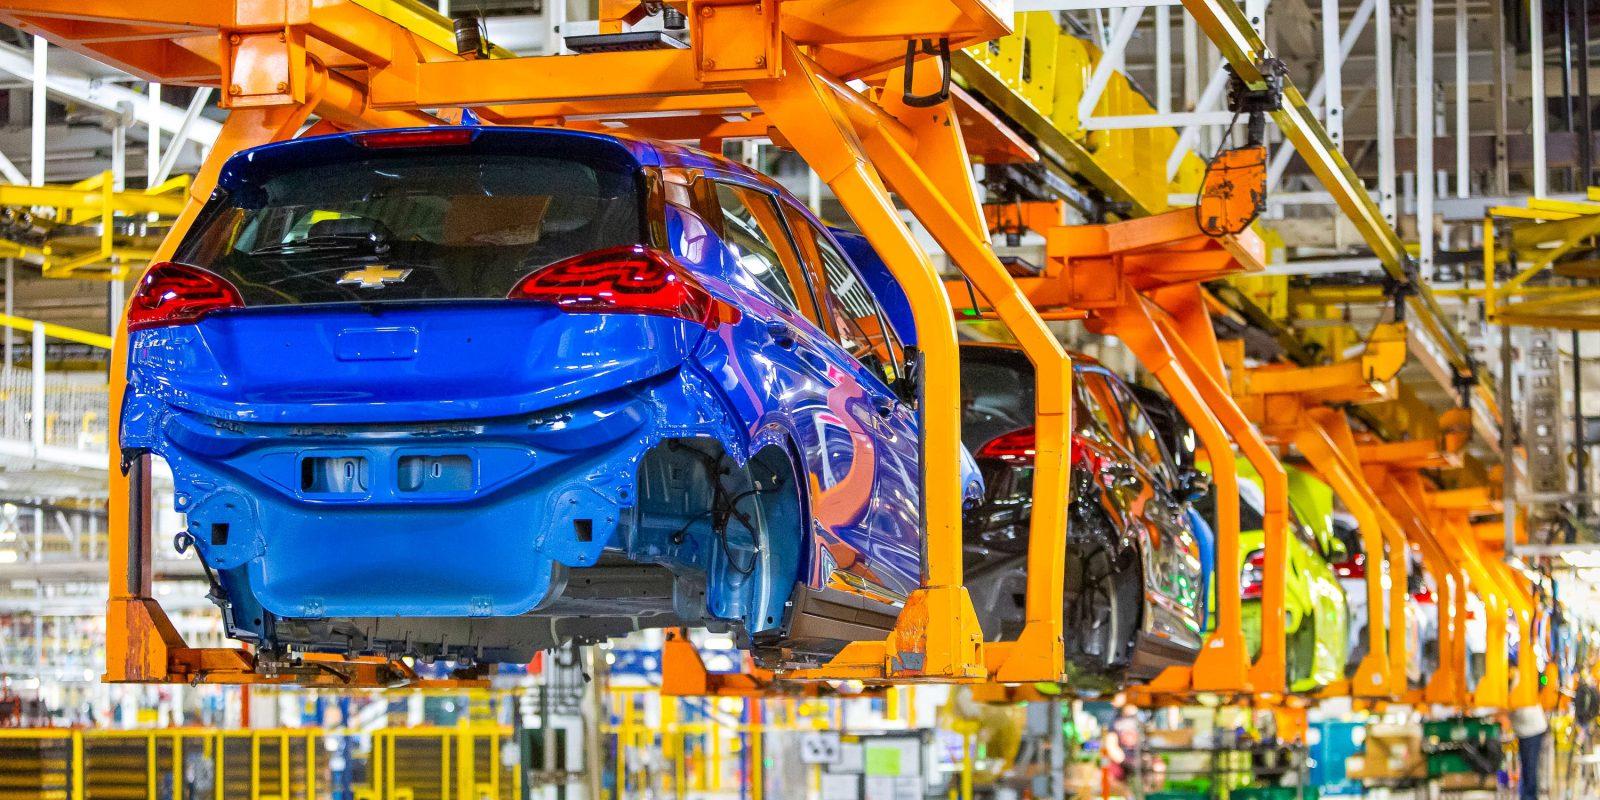 GM investors pressuring automaker to push back on Trump admin's fuel economy rollback plan